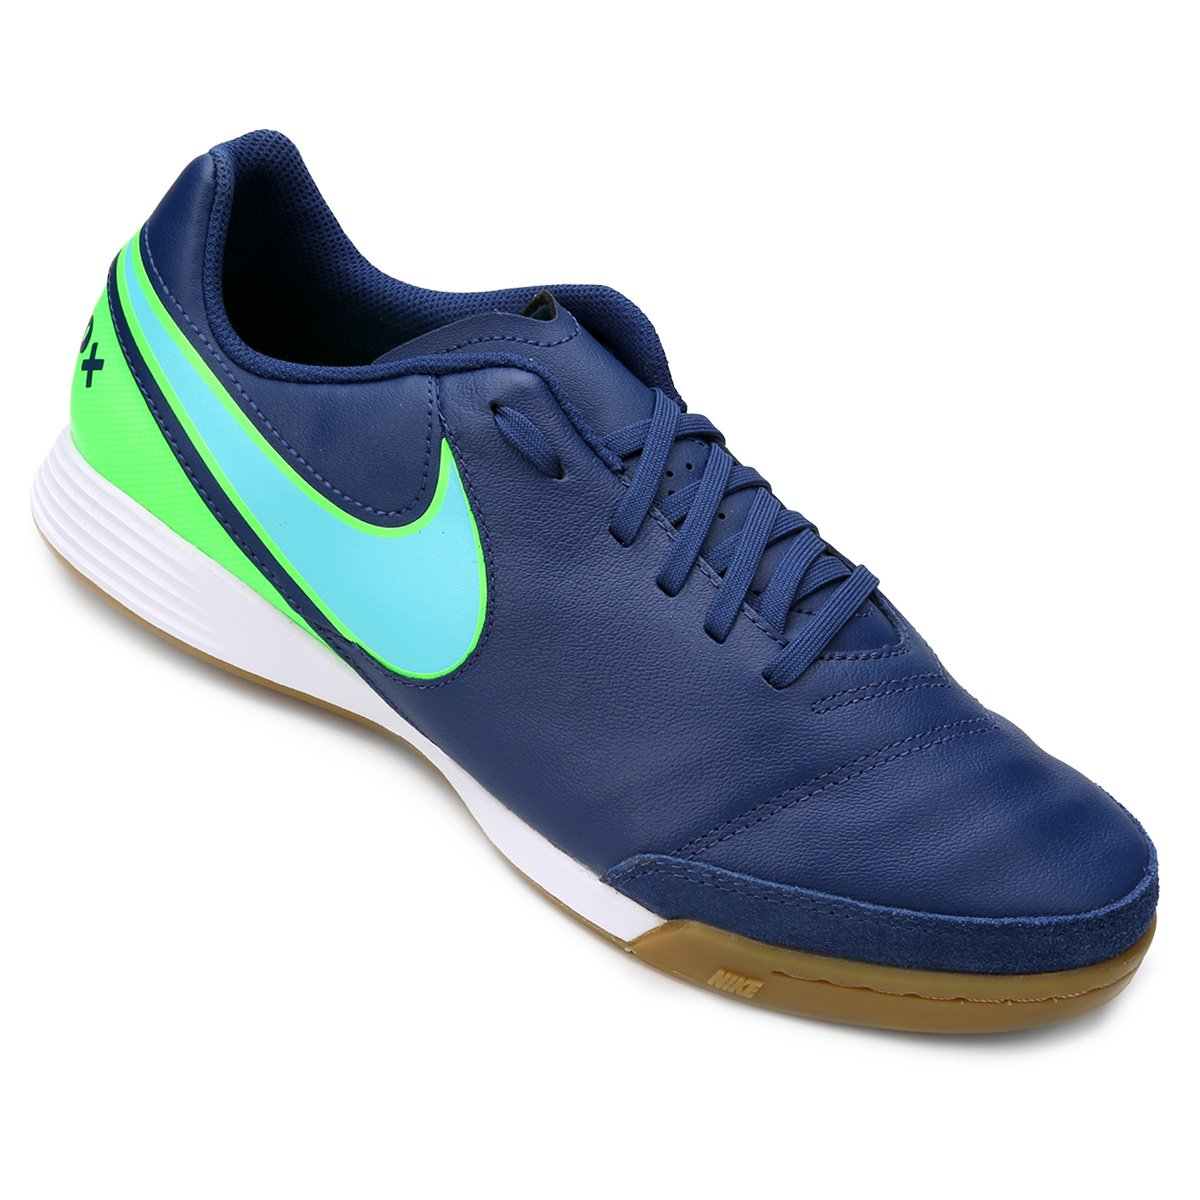 0d87adda36753 Chuteira Futsal Nike Tiempo Genio 2 Leather IC - Compre Agora